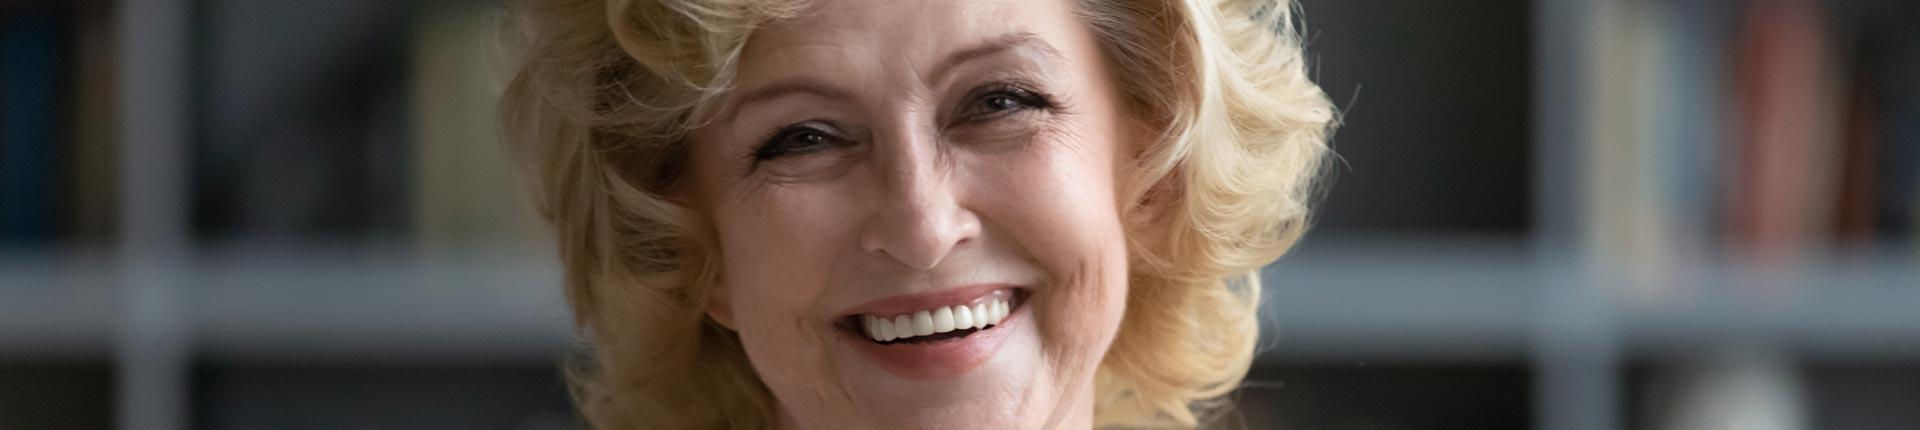 Happy elderly woman after having endodontic surgery